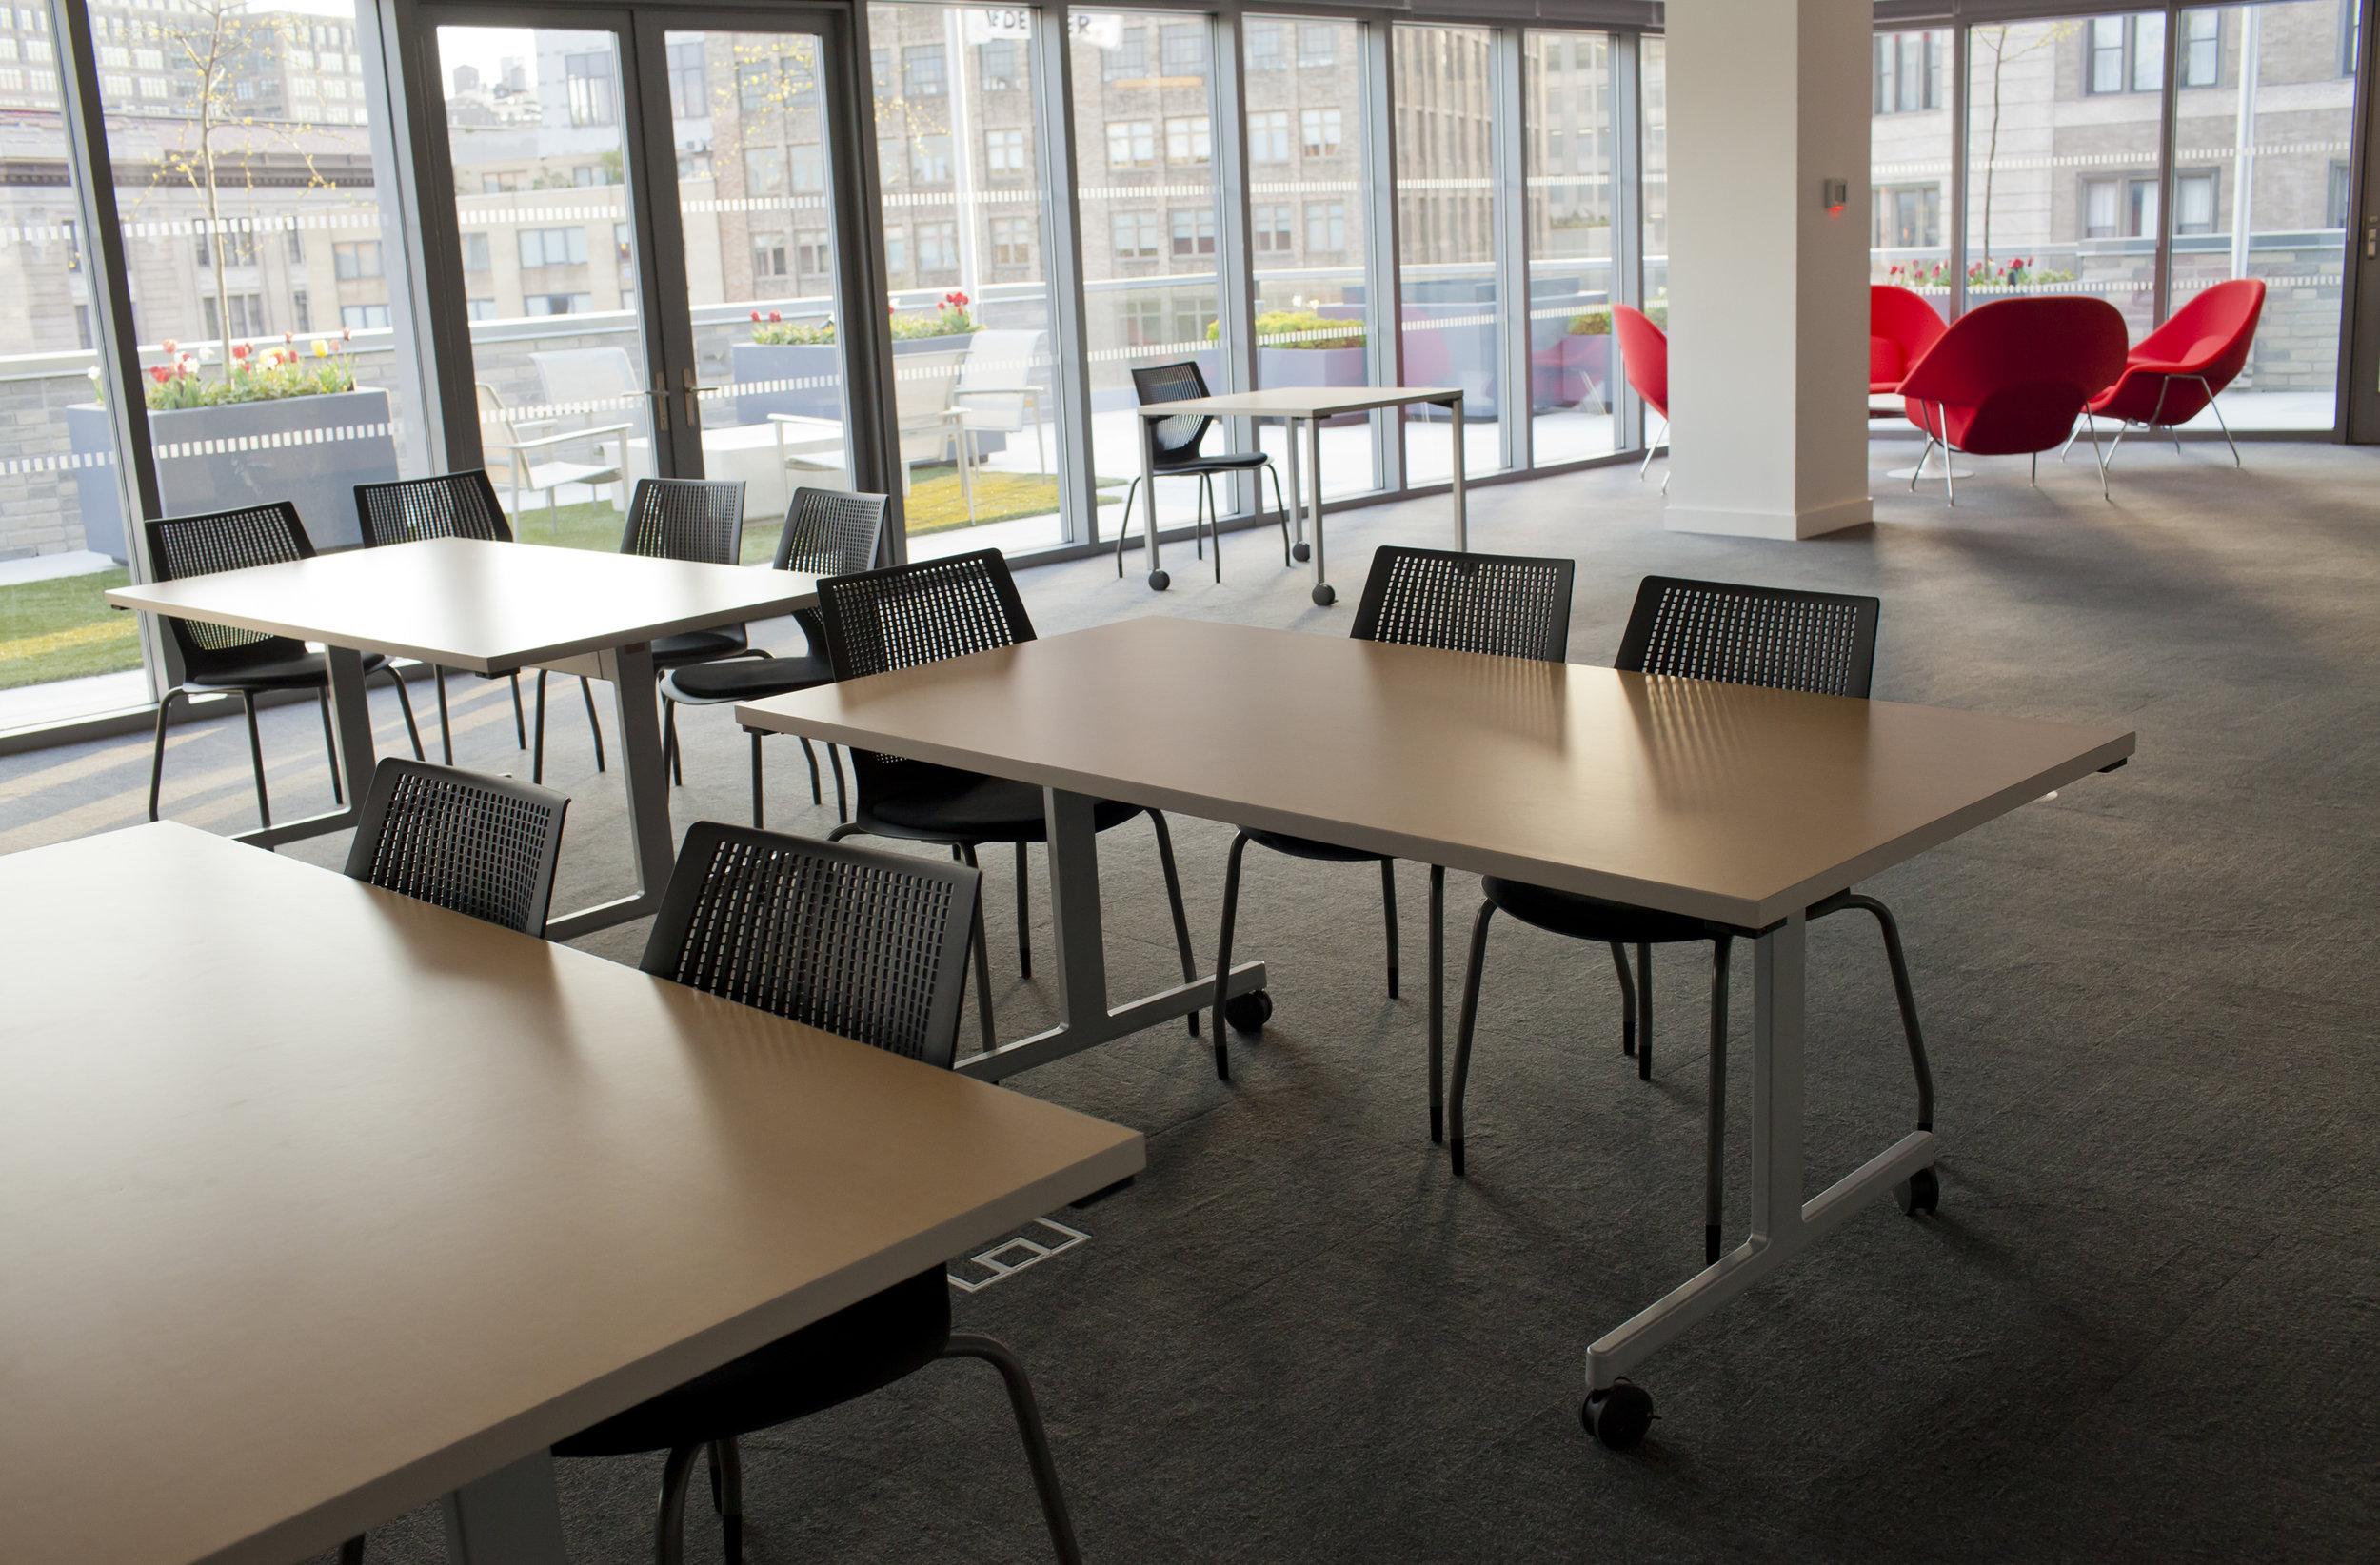 5th Floor (classroom style) 3.jpg